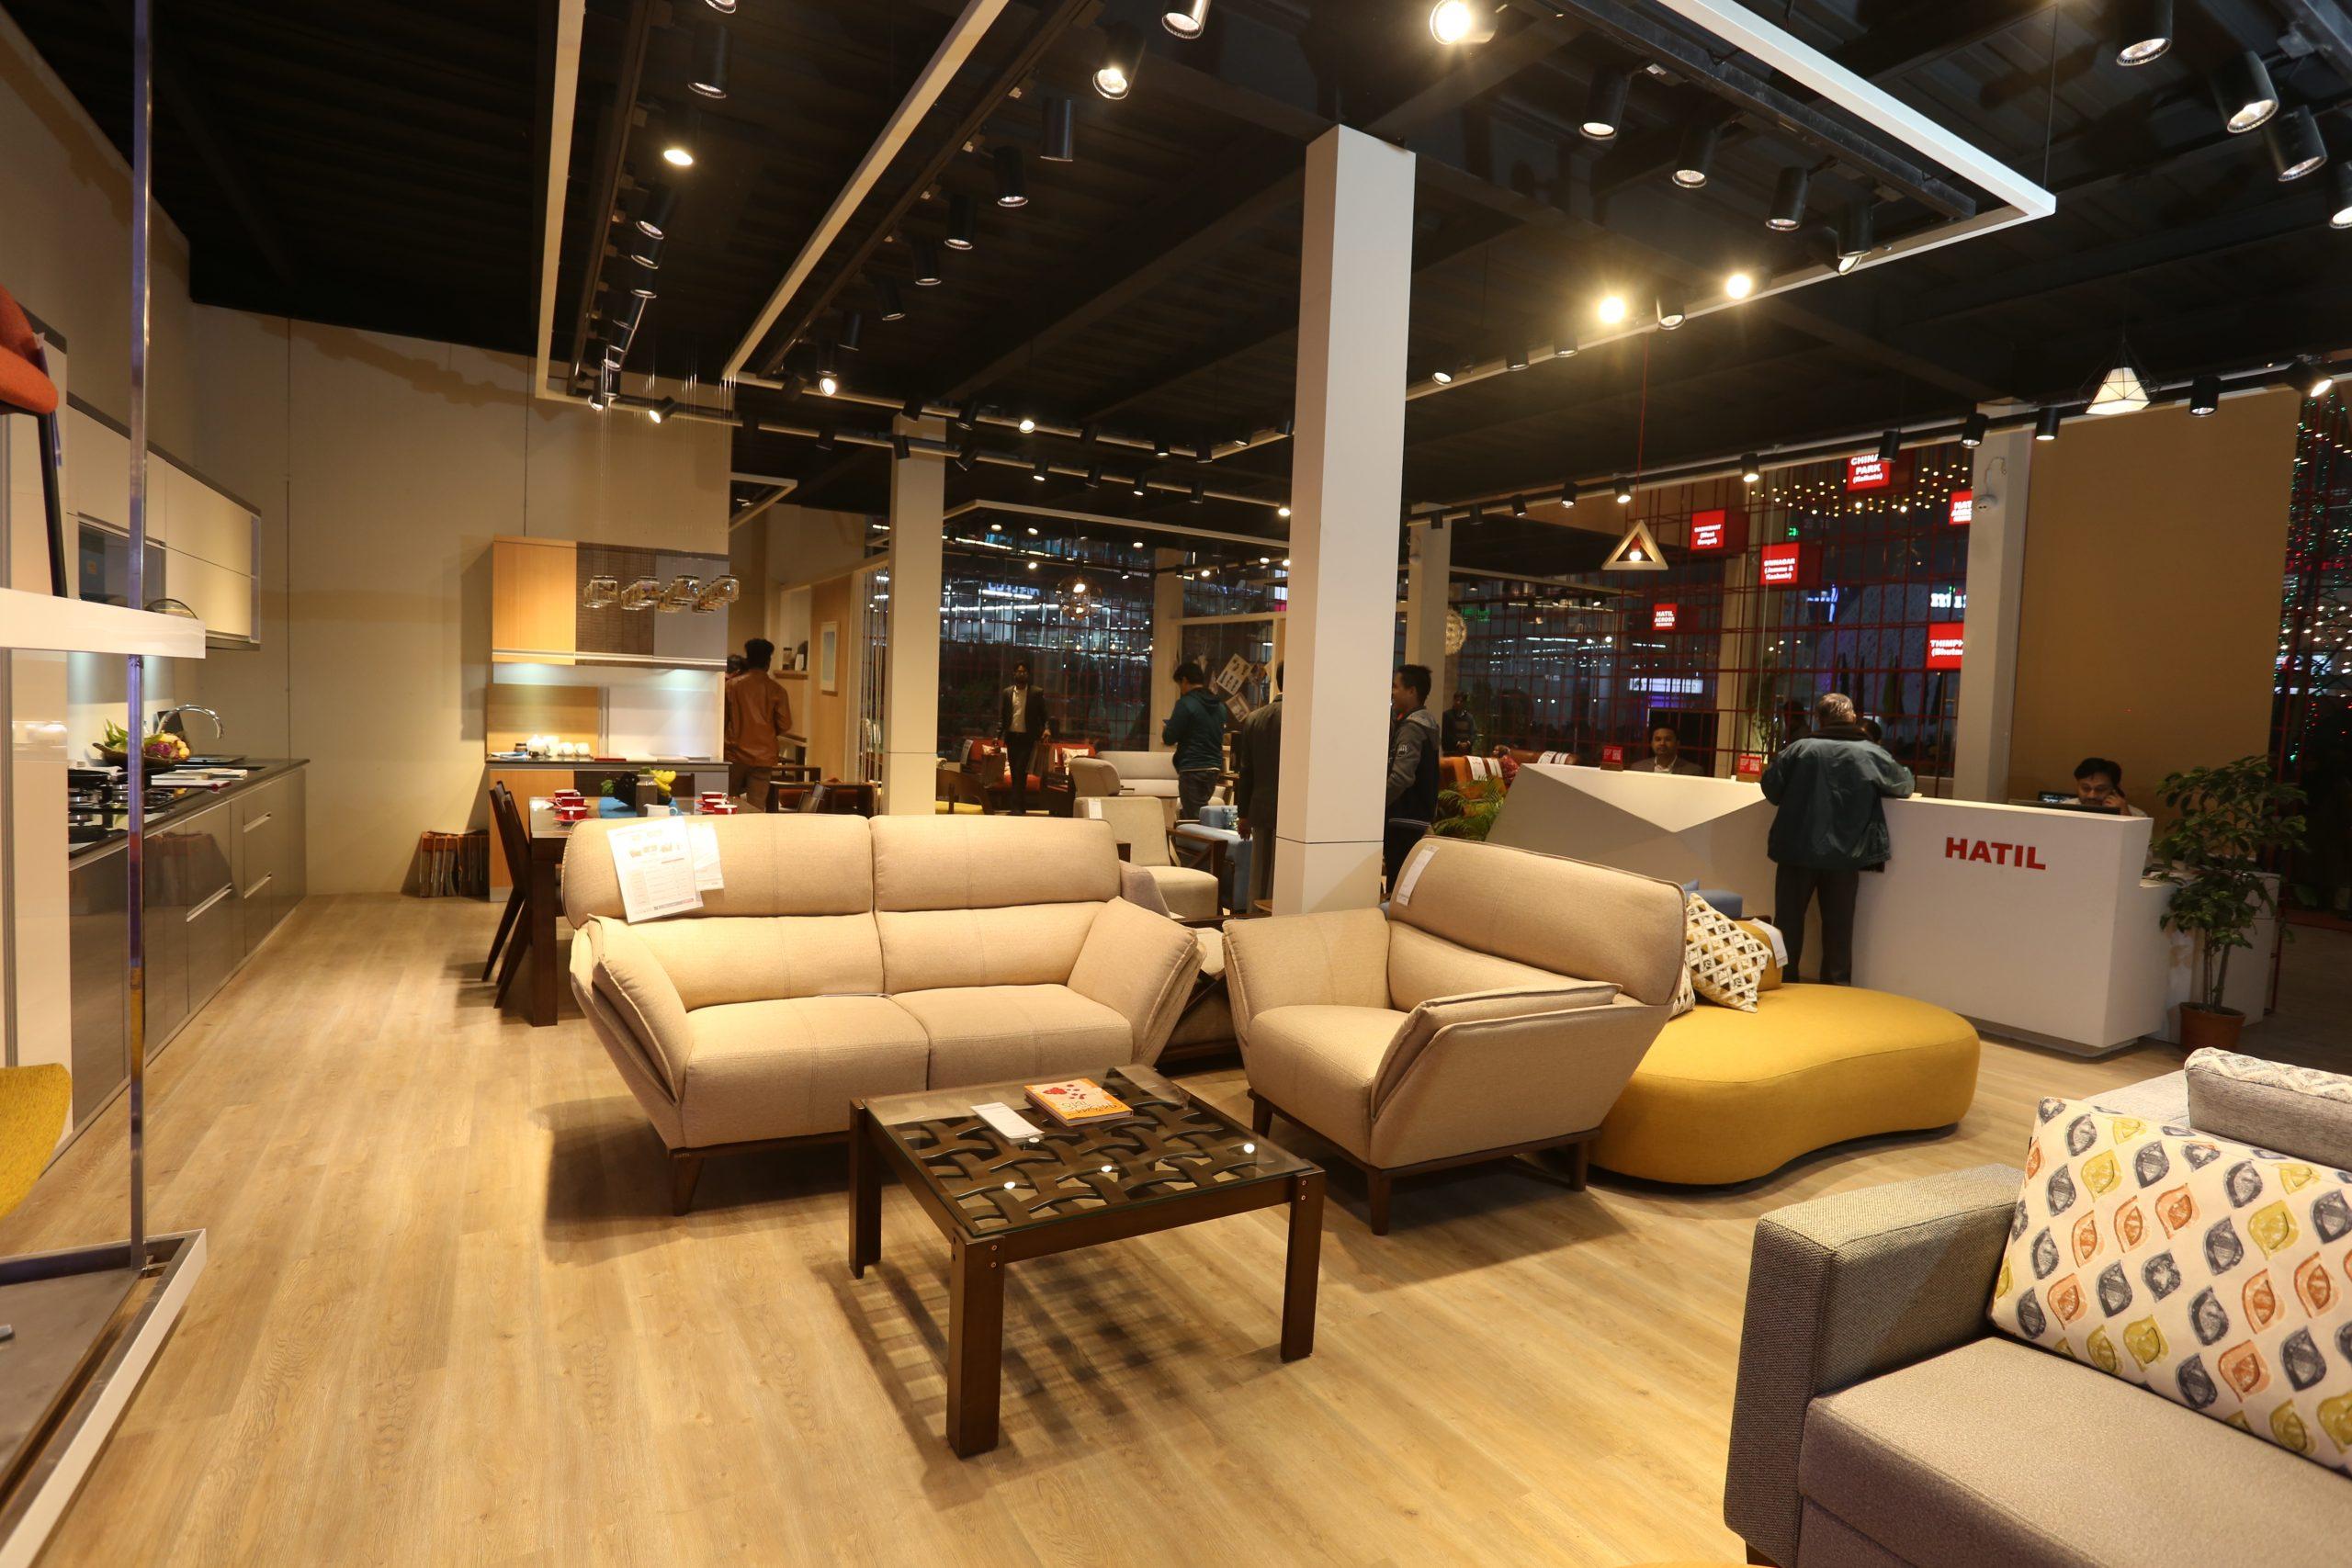 DTC-Pavilion-HATIL-Furniture-Dhaka-International-Trade-Fair-Interior